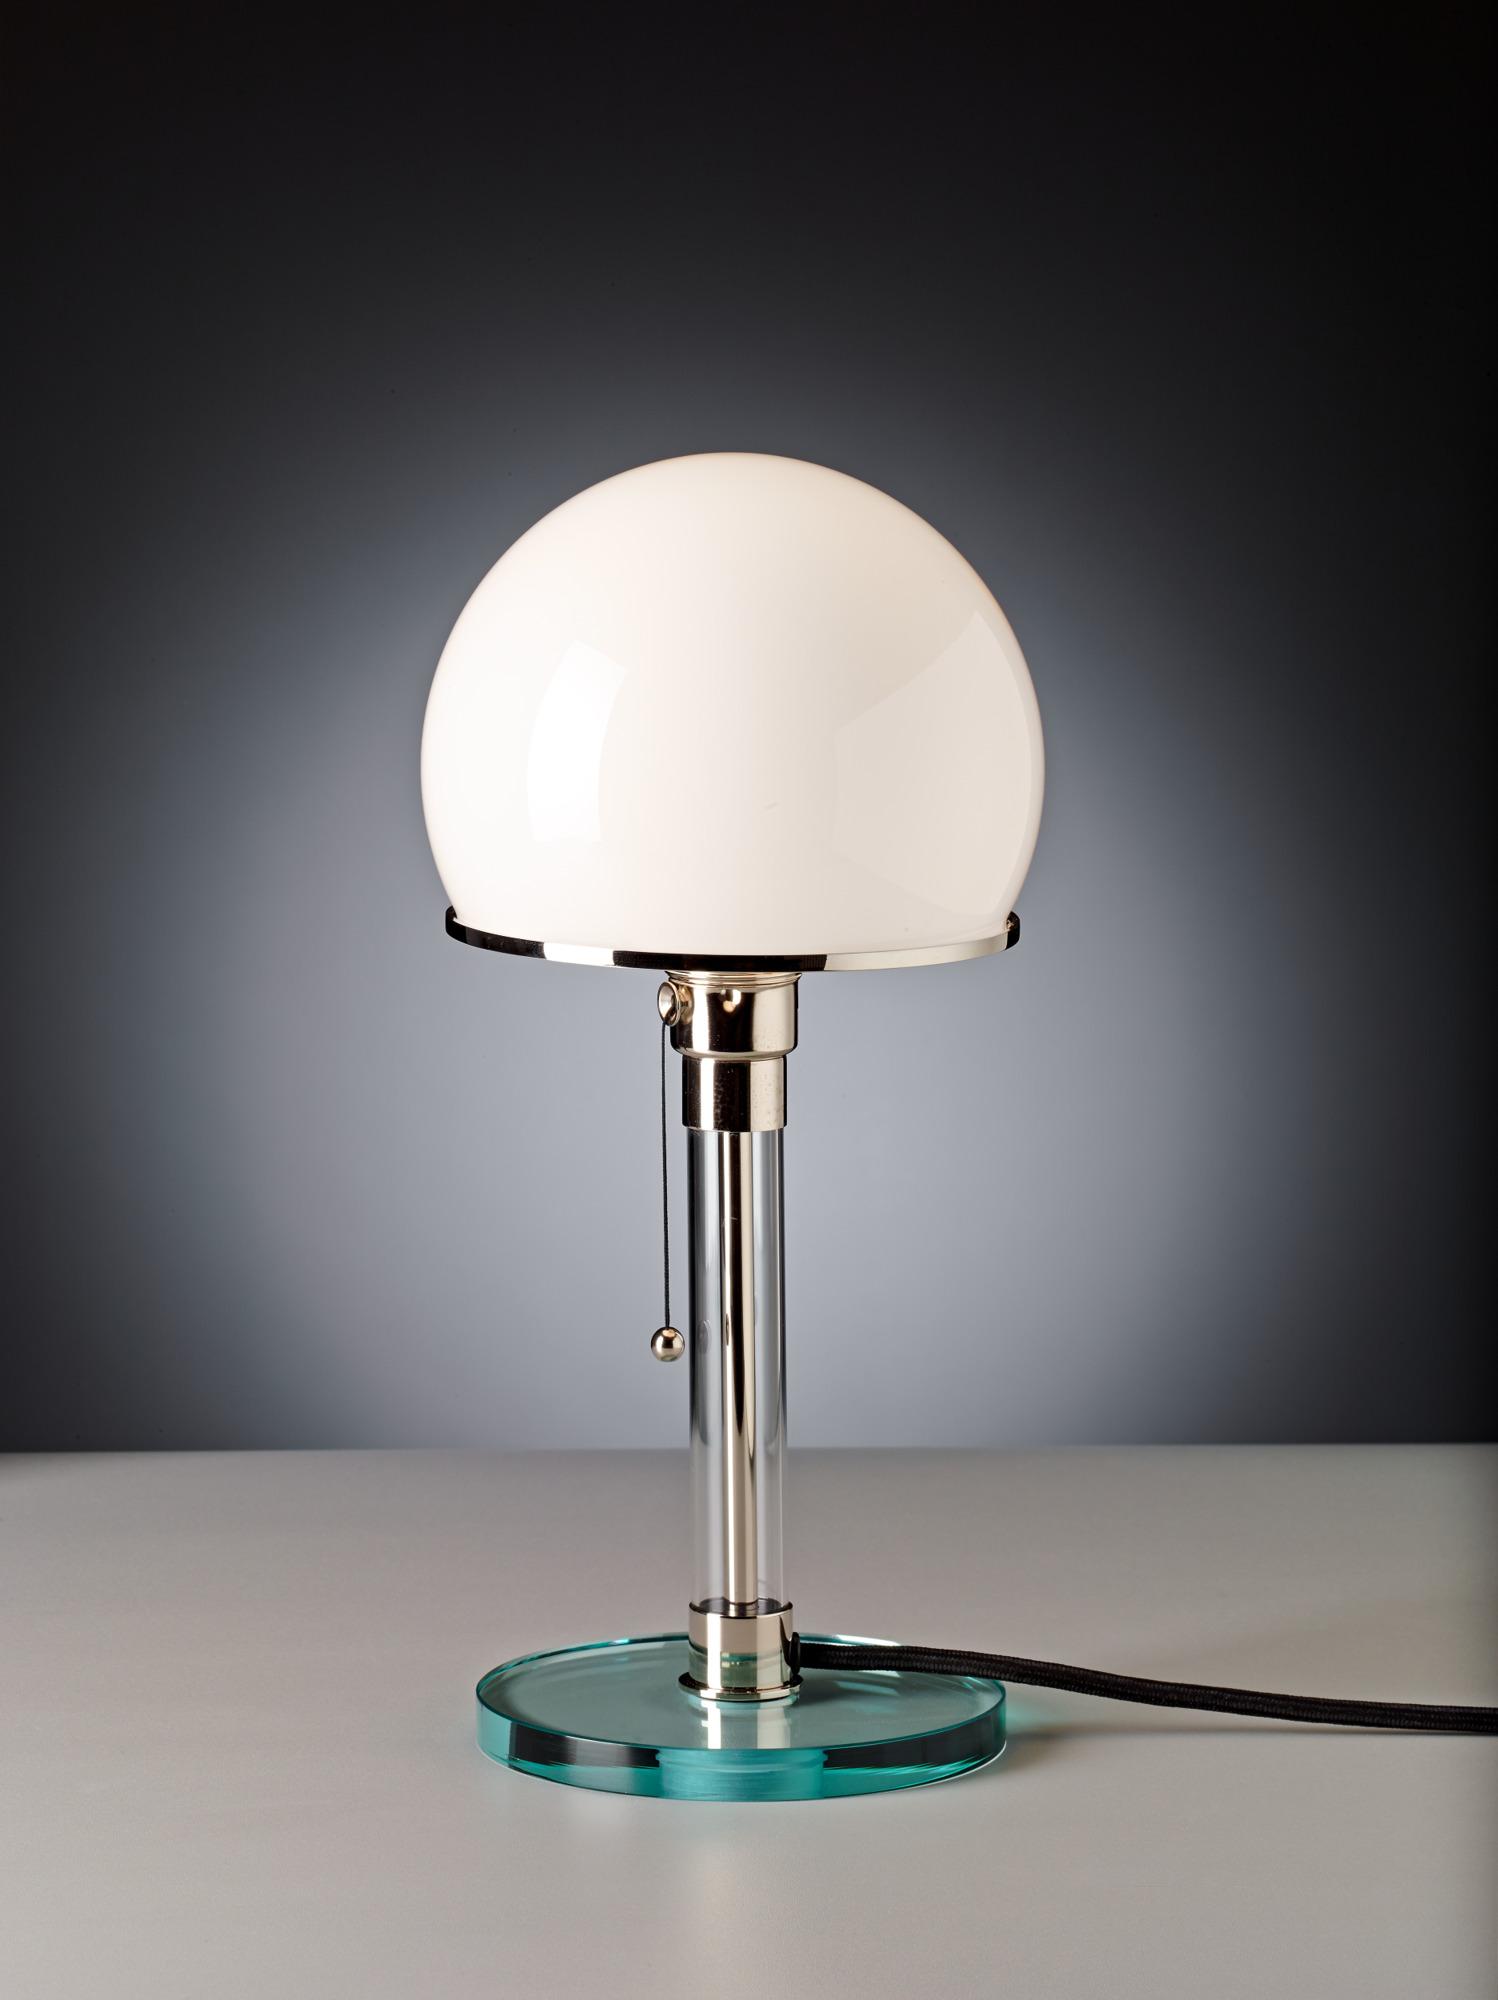 WG24 / WG 24 Wagenfeld Table Lamp Tecnolumen